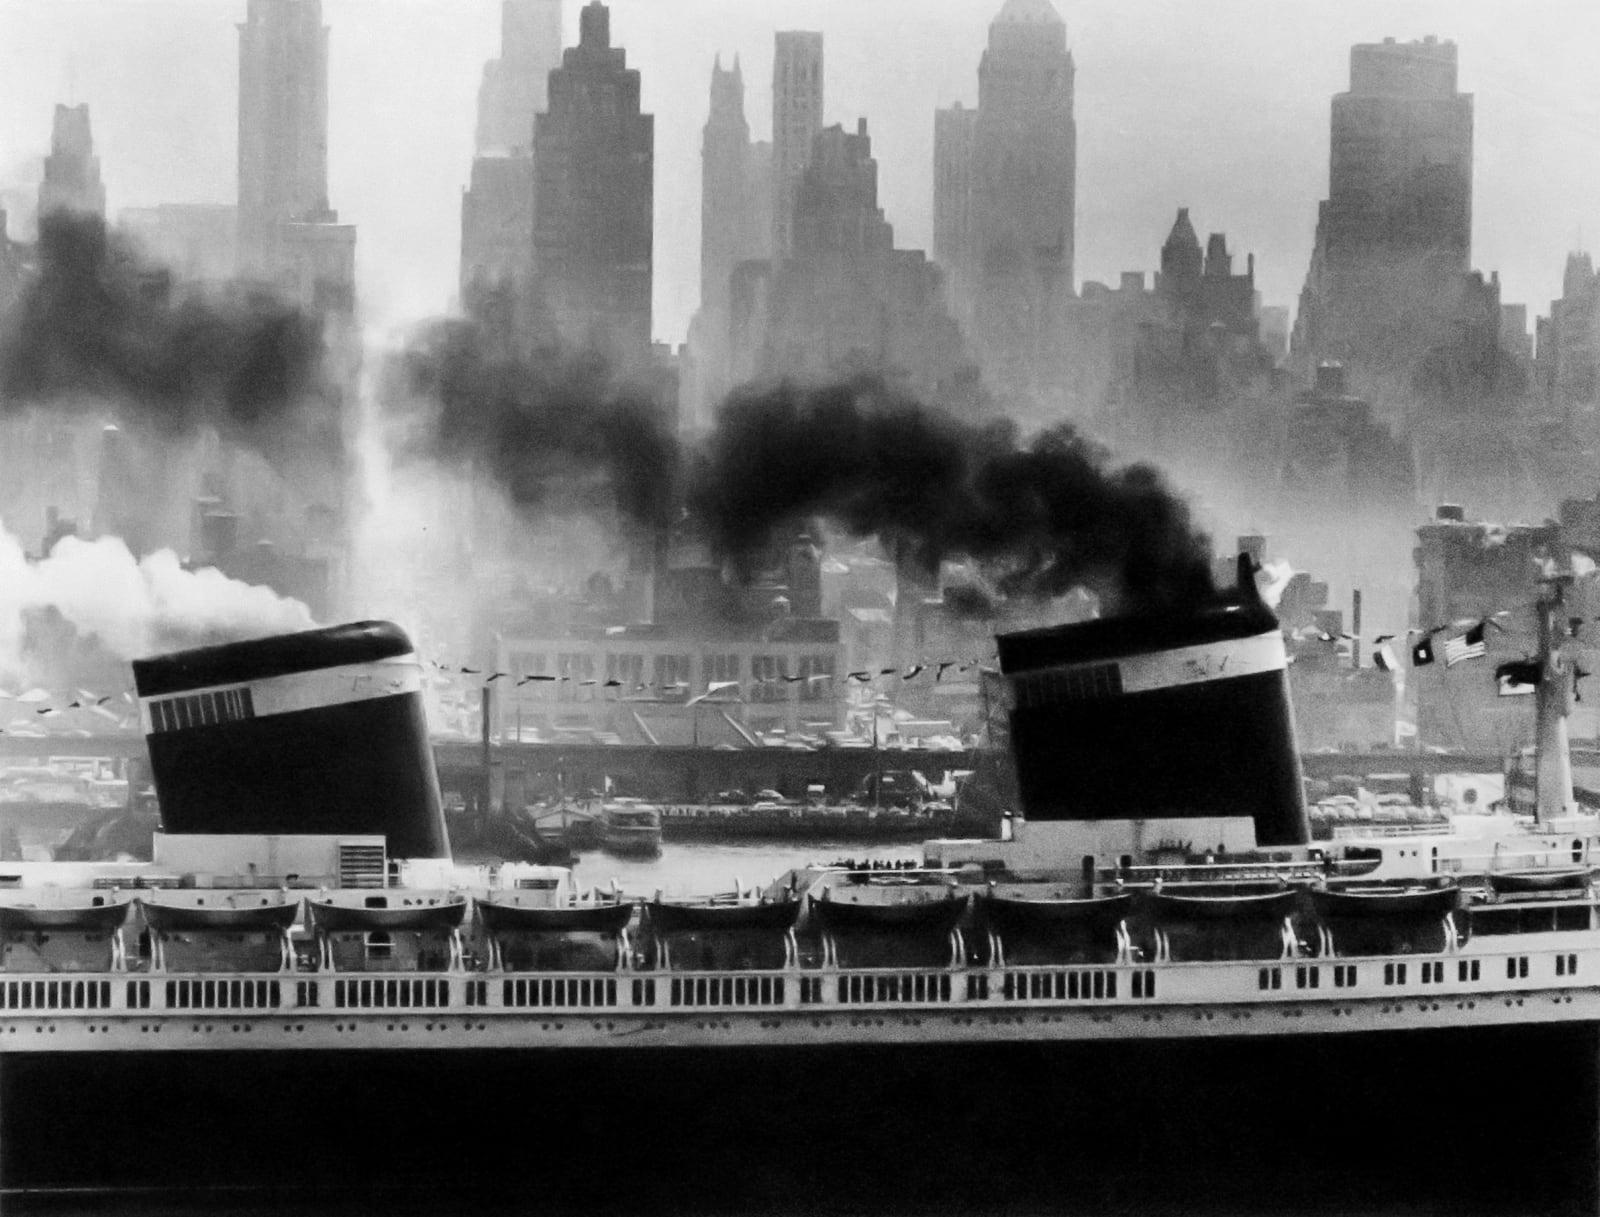 Andreas Feininger - The